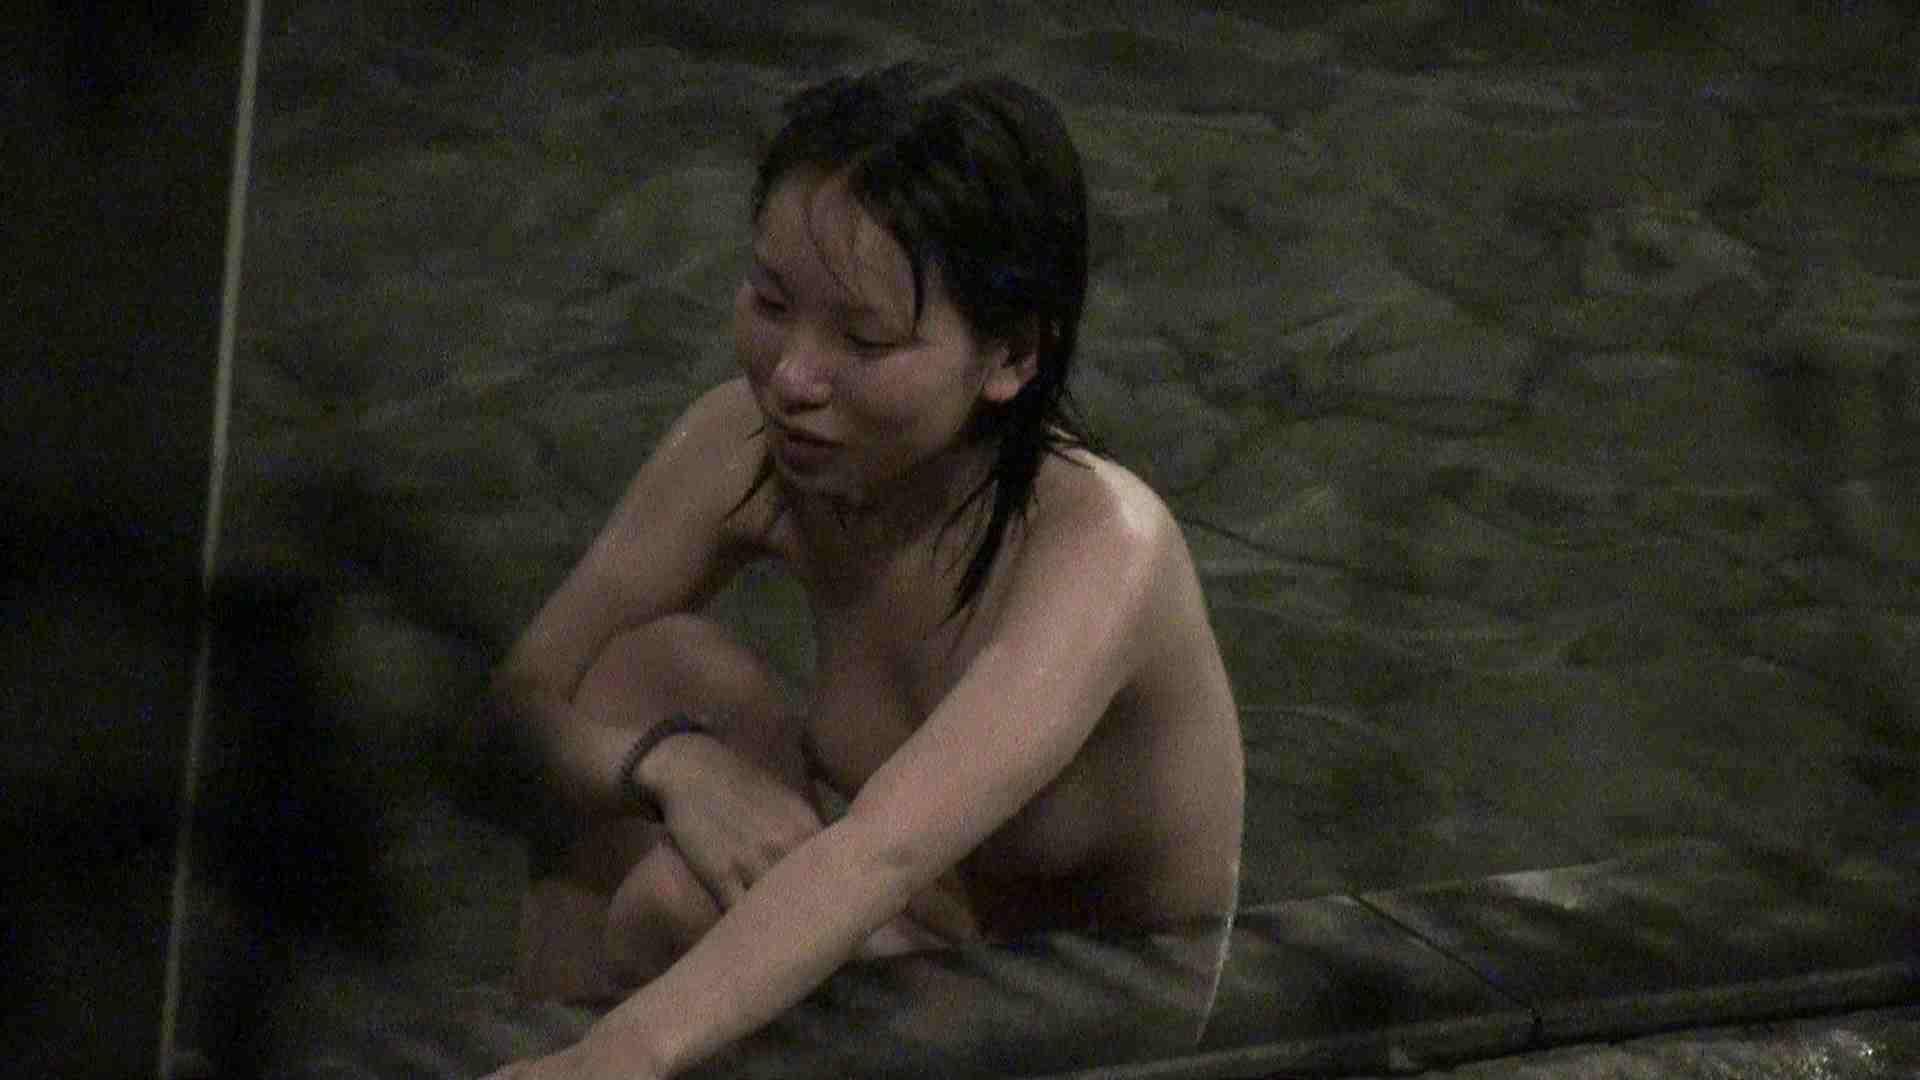 Aquaな露天風呂Vol.363 盗撮 | OLセックス  90画像 10